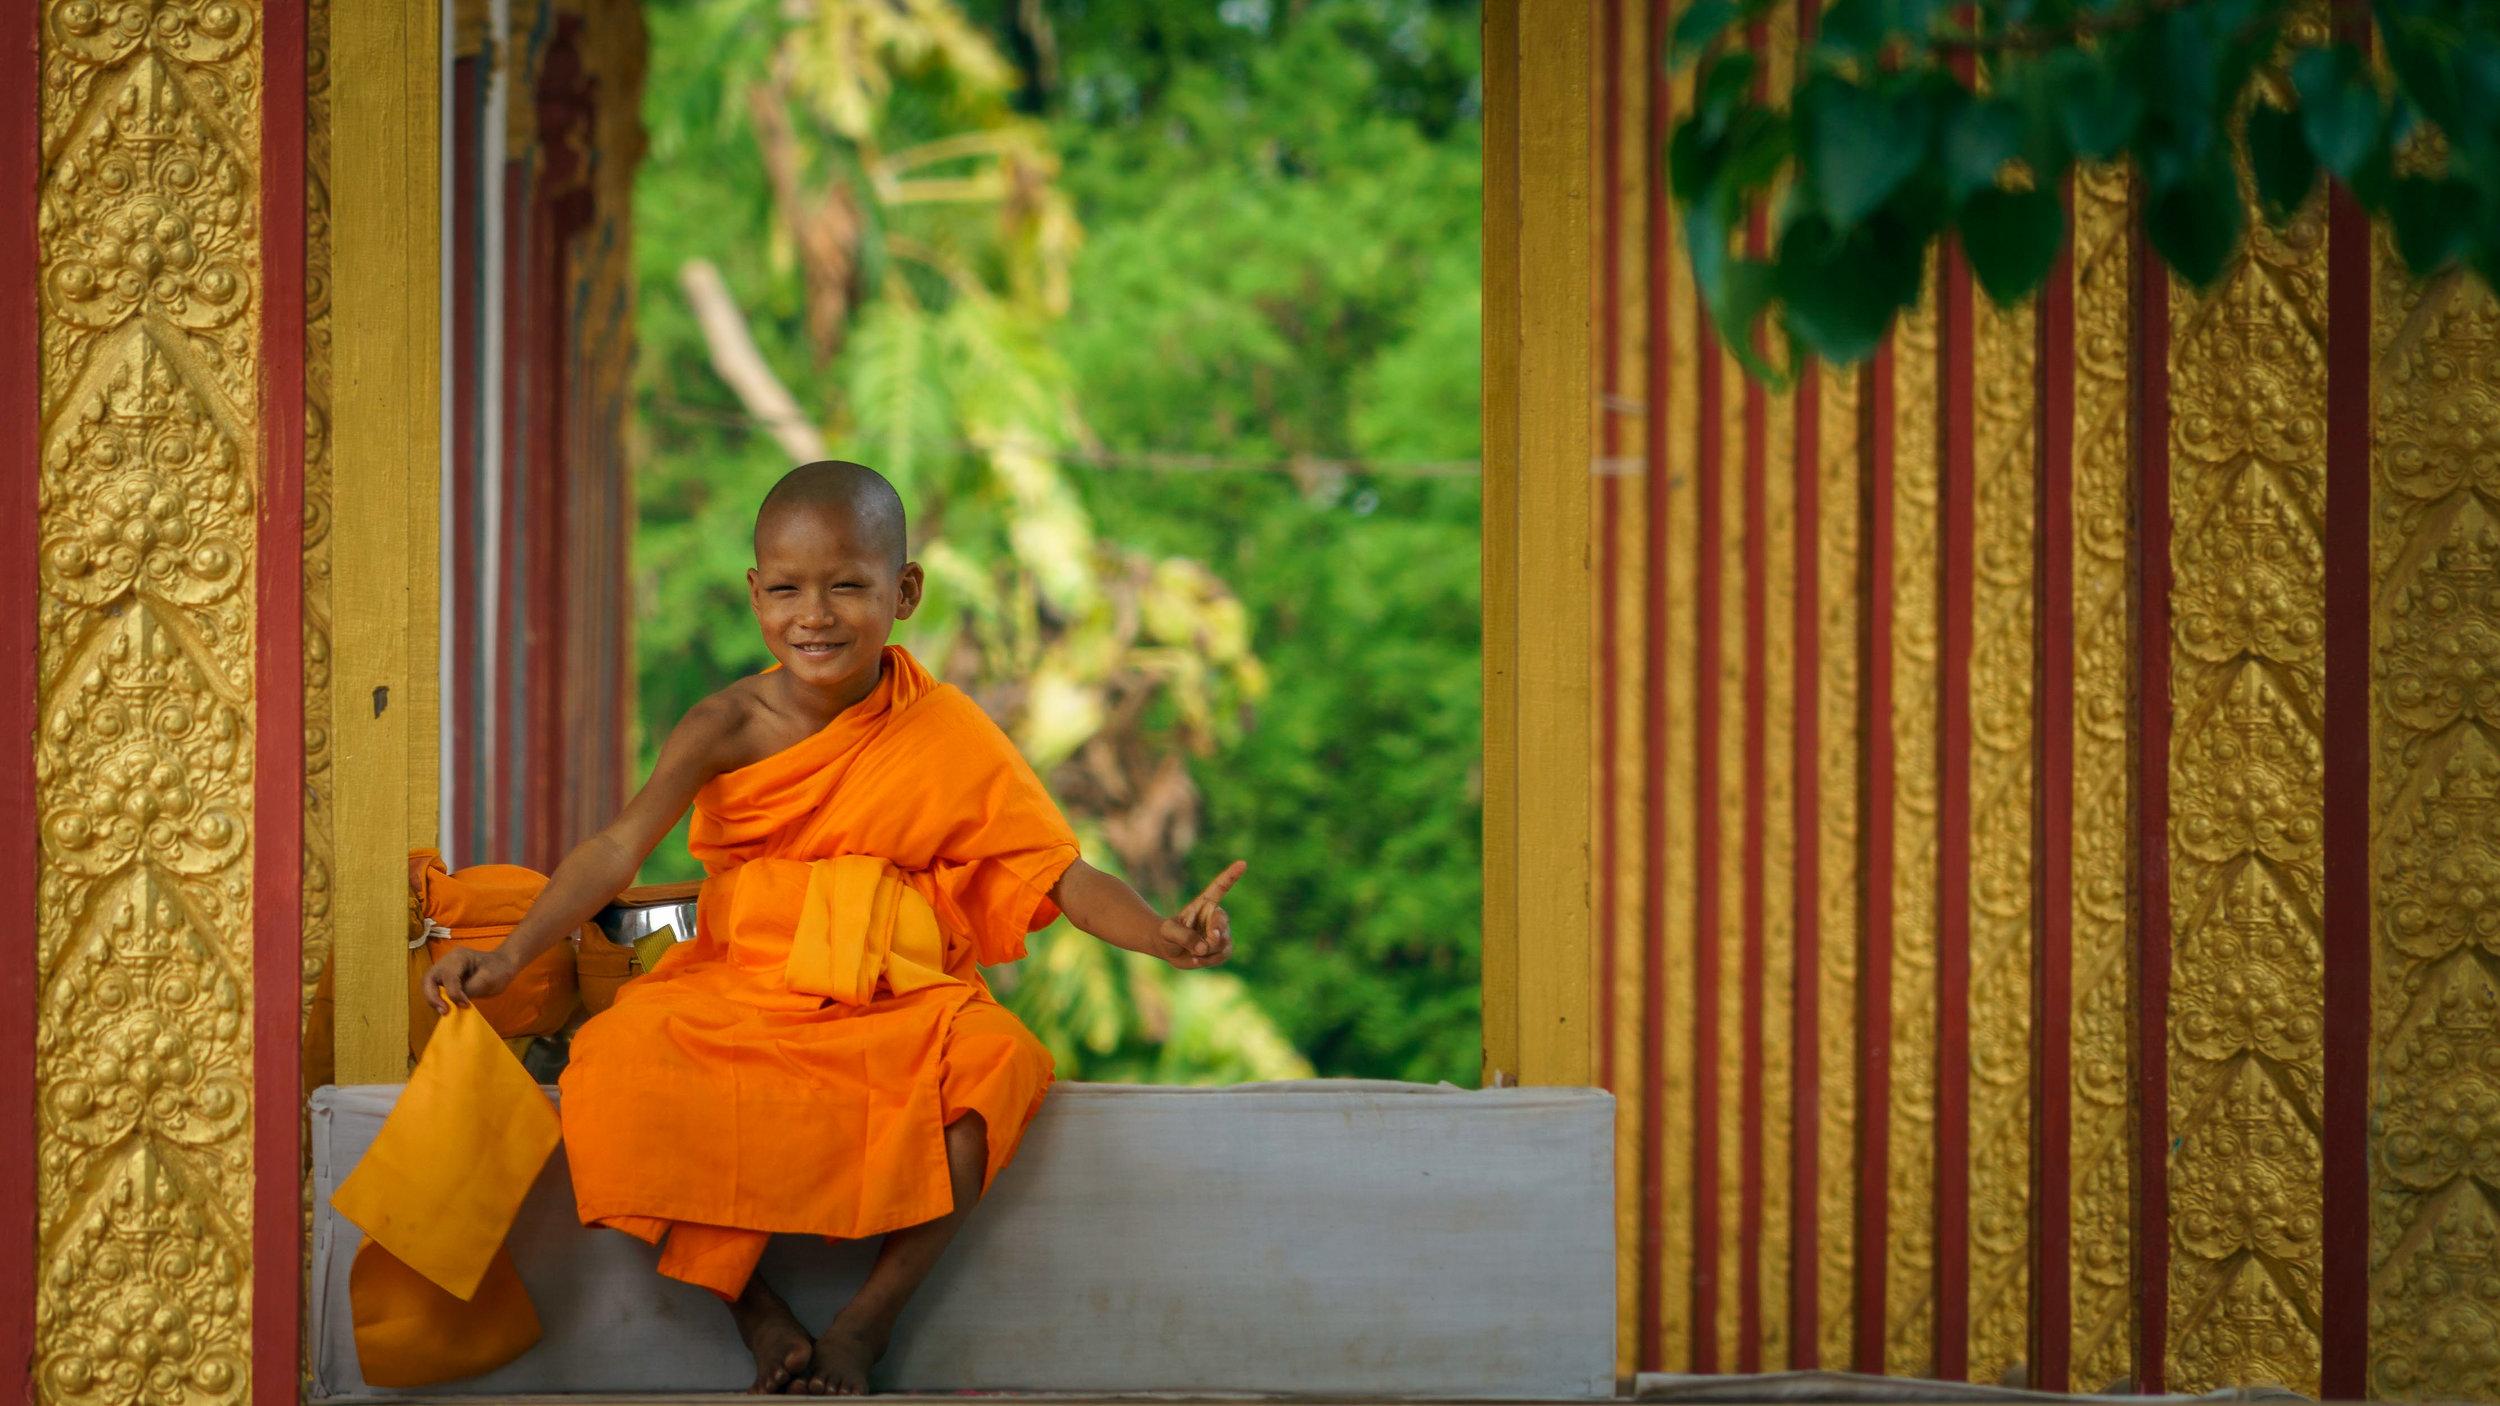 Siem Reap Private Photography Tour Angkor Wat-2.jpg